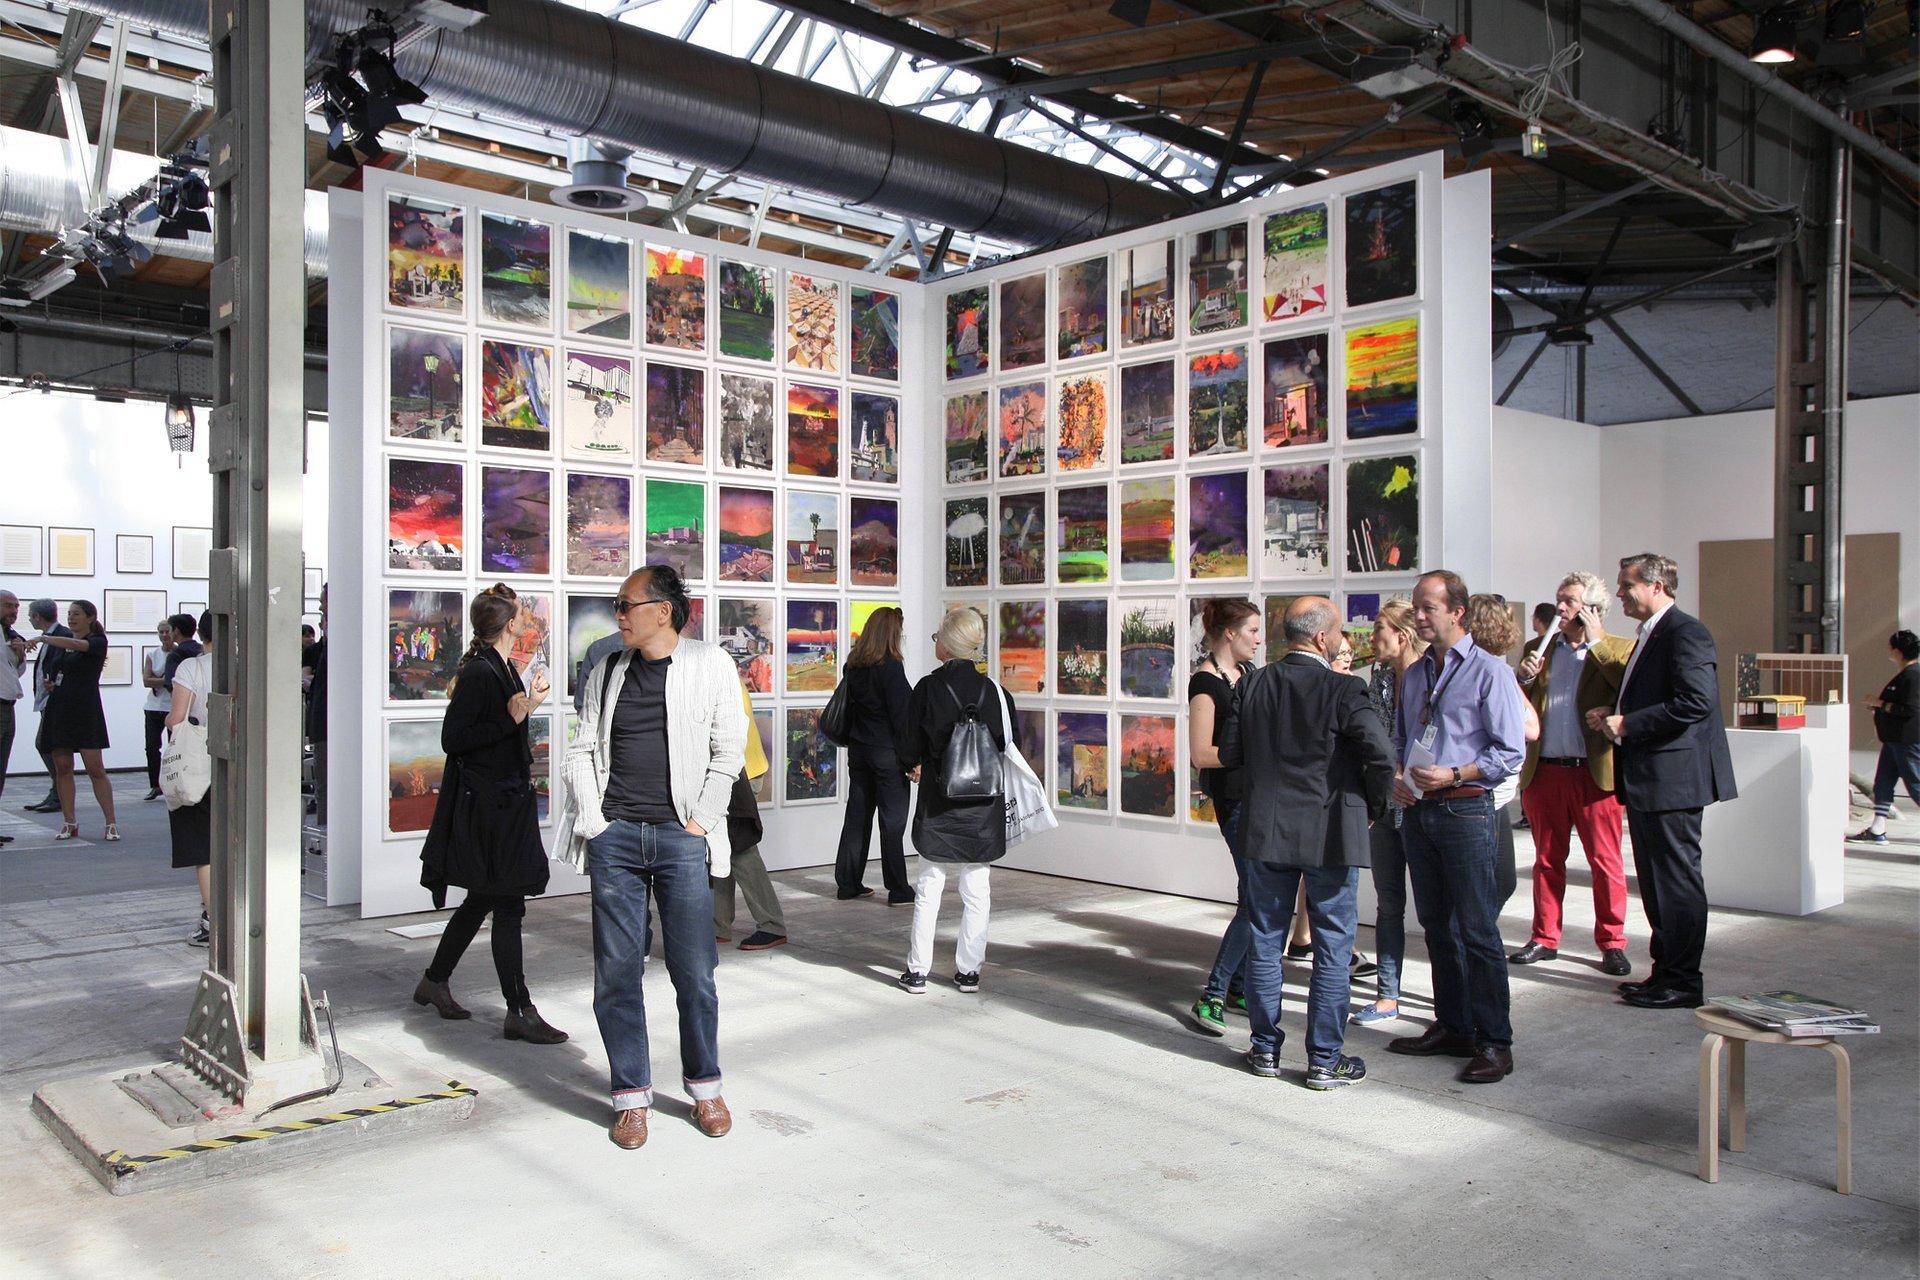 abc Austellungsansicht / installation view, 2015, Blain Southern, Marius Bercea 2020